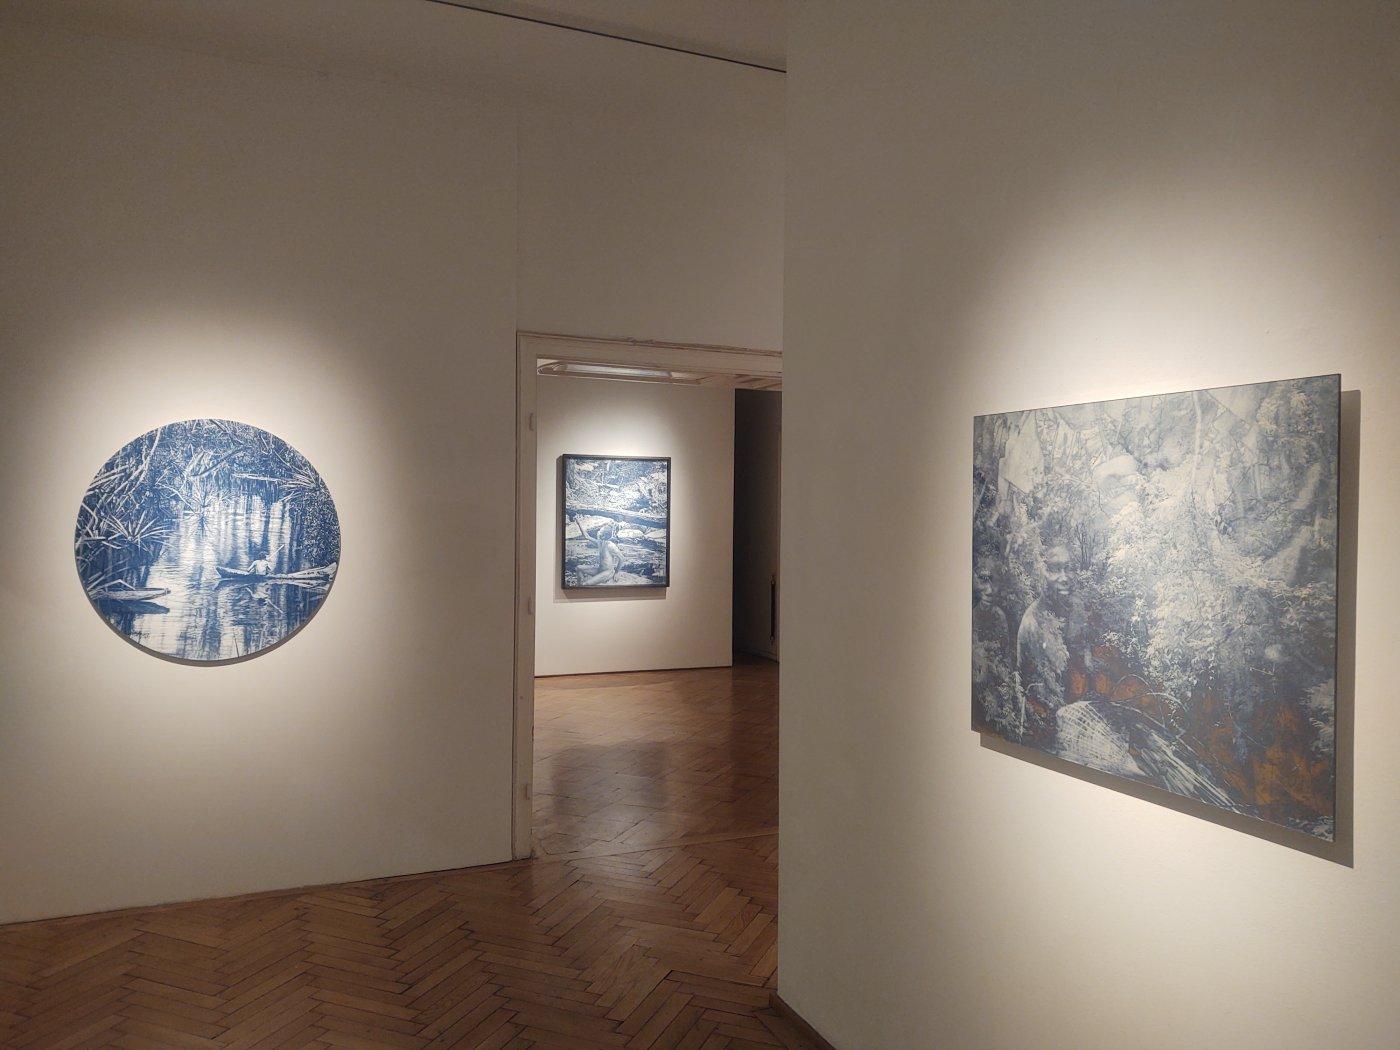 Galerie Ernst Hilger Terra Australis 2